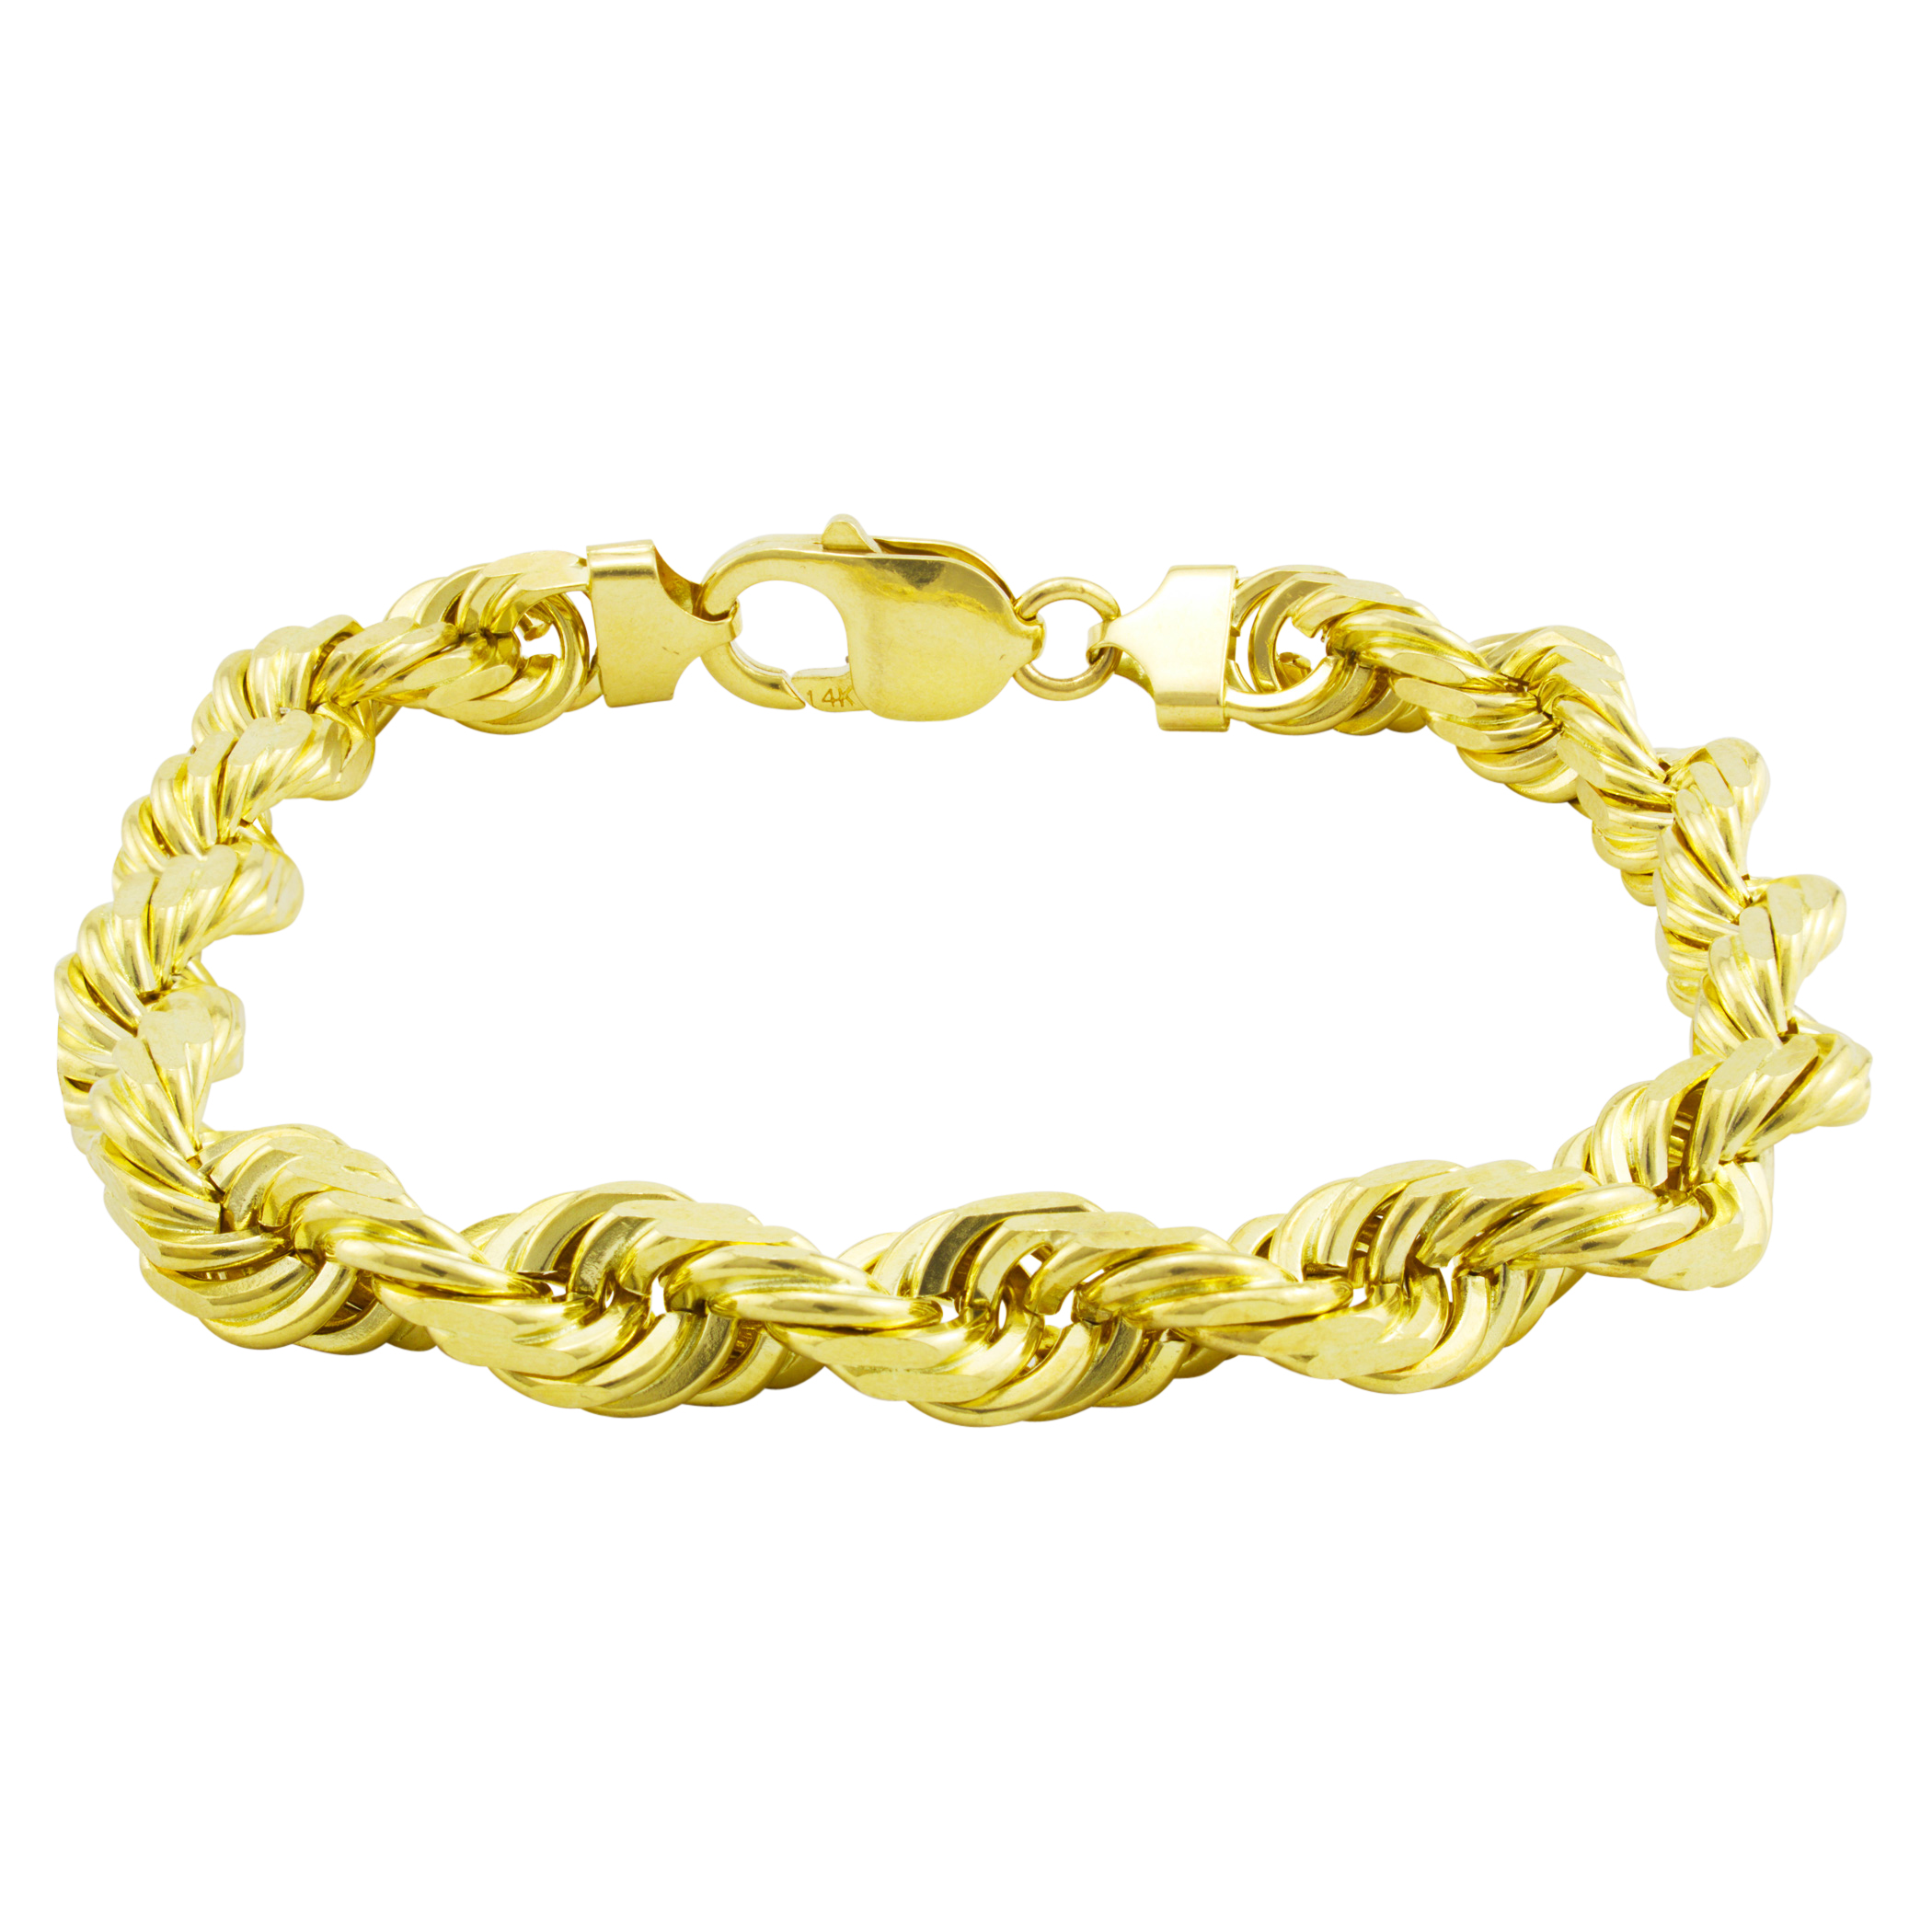 d6c215a5ed9649 14k Yellow Gold Mens 10mm Italian Diamond Cut SOLID Rope Chain ...